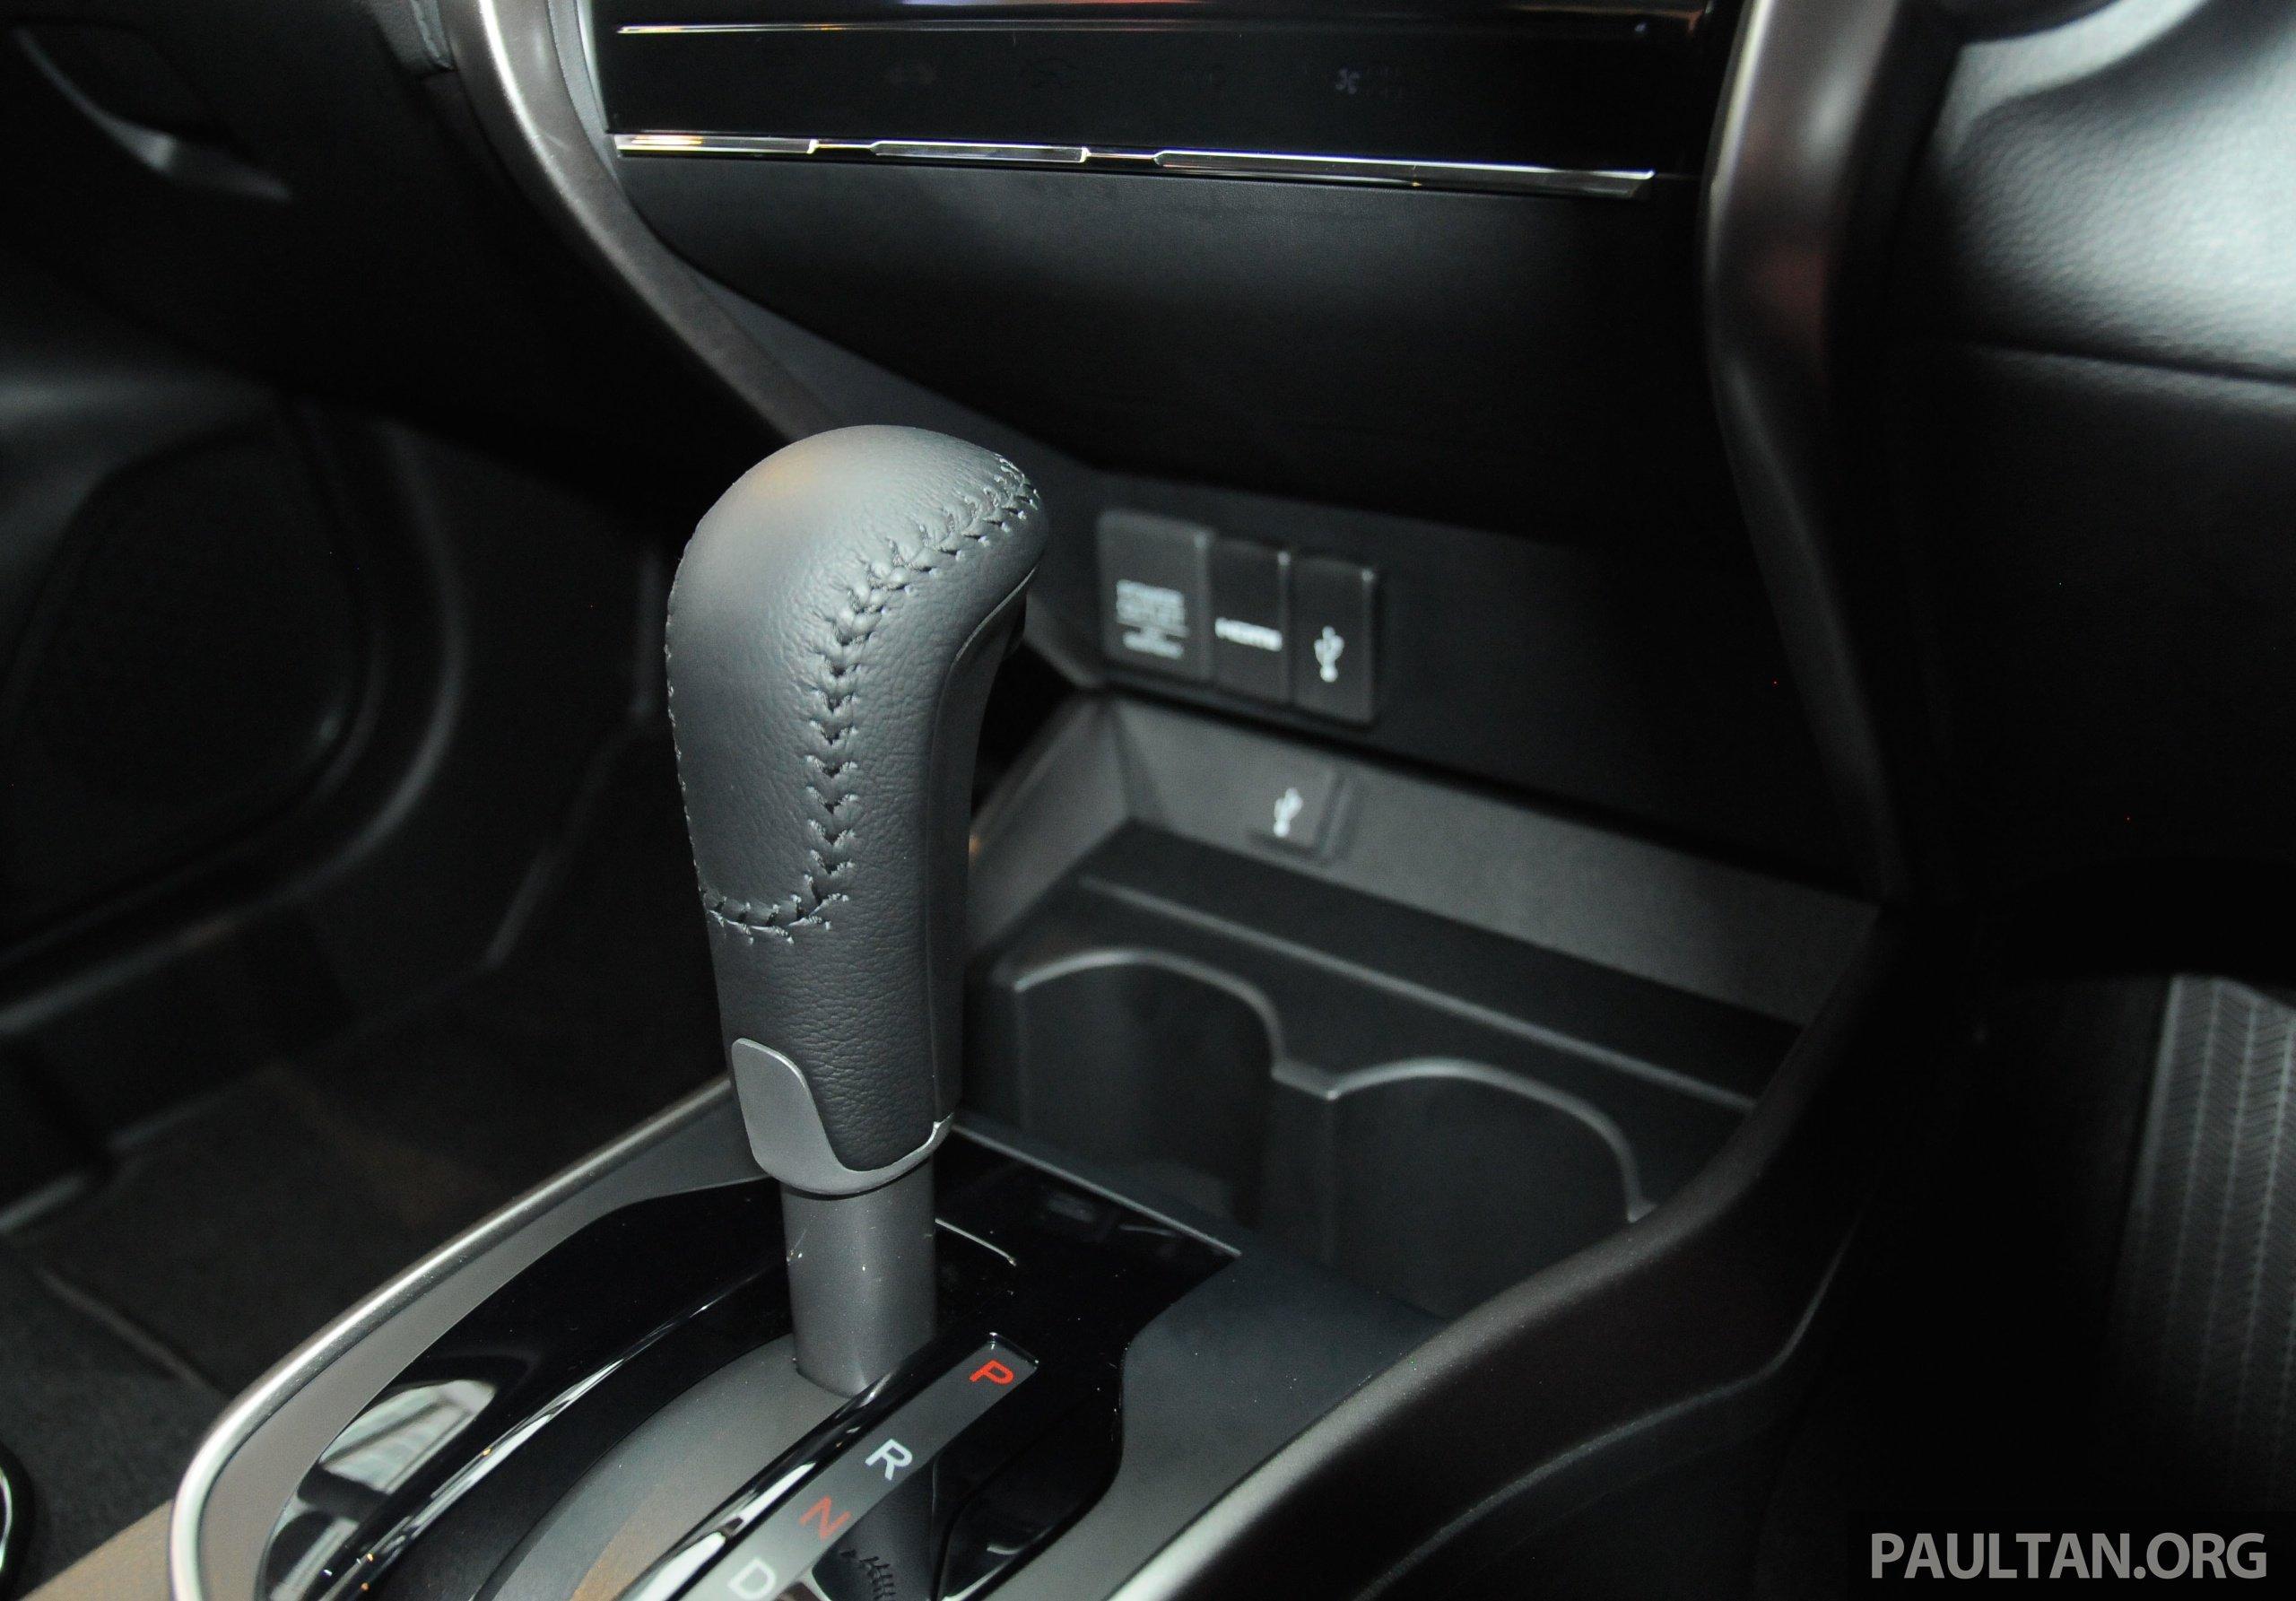 GALLERY: 2014 Honda City spec-by-spec comparison Image 236405